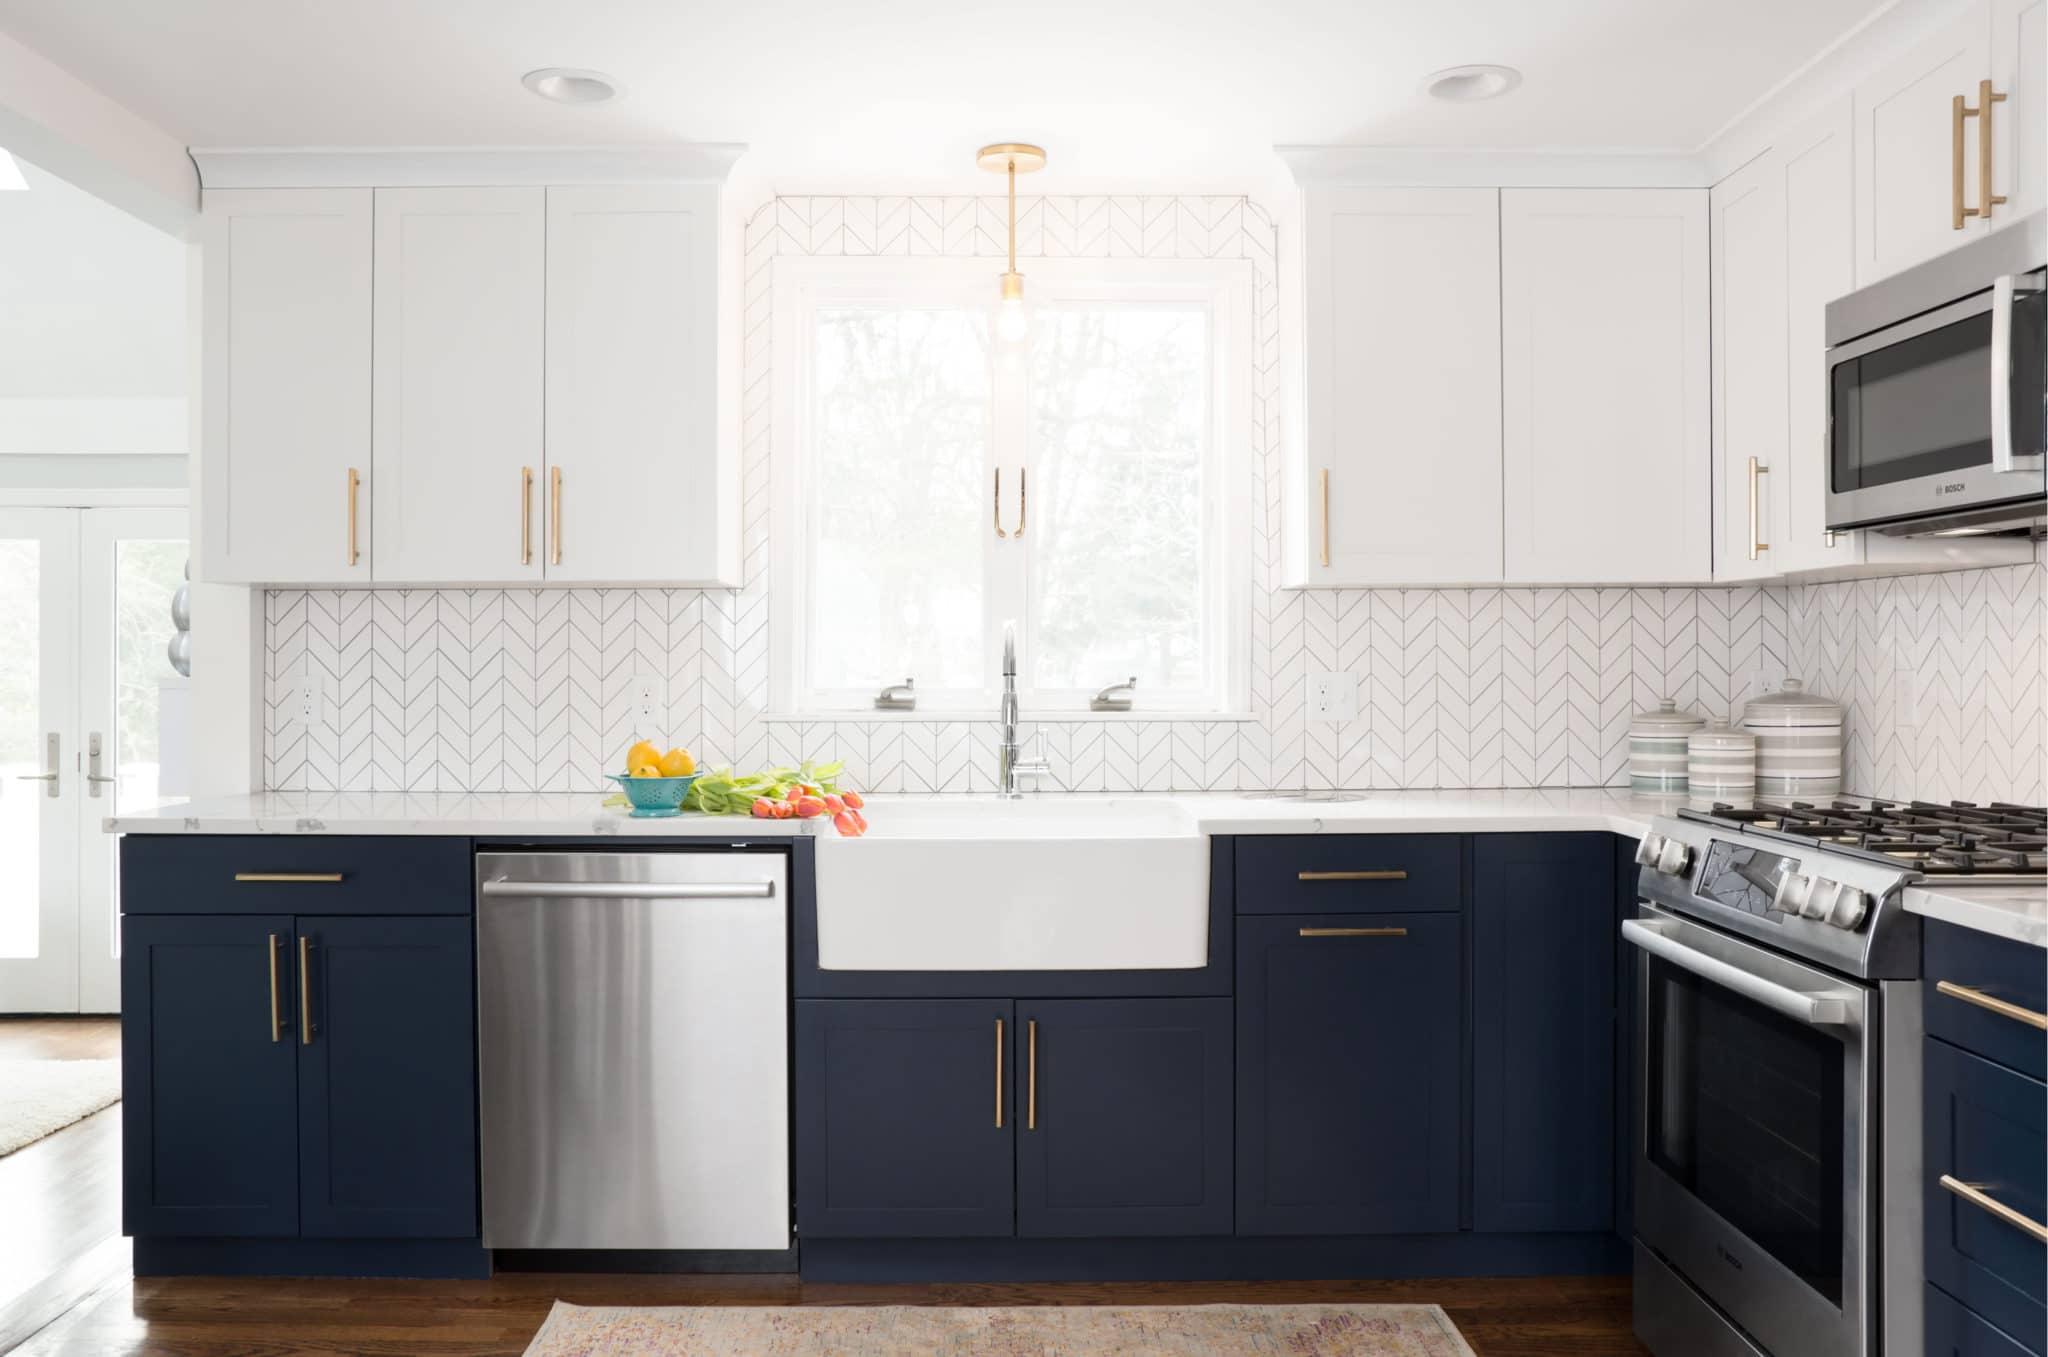 Custom Massachusetts Kitchen Cabinets and Countertops